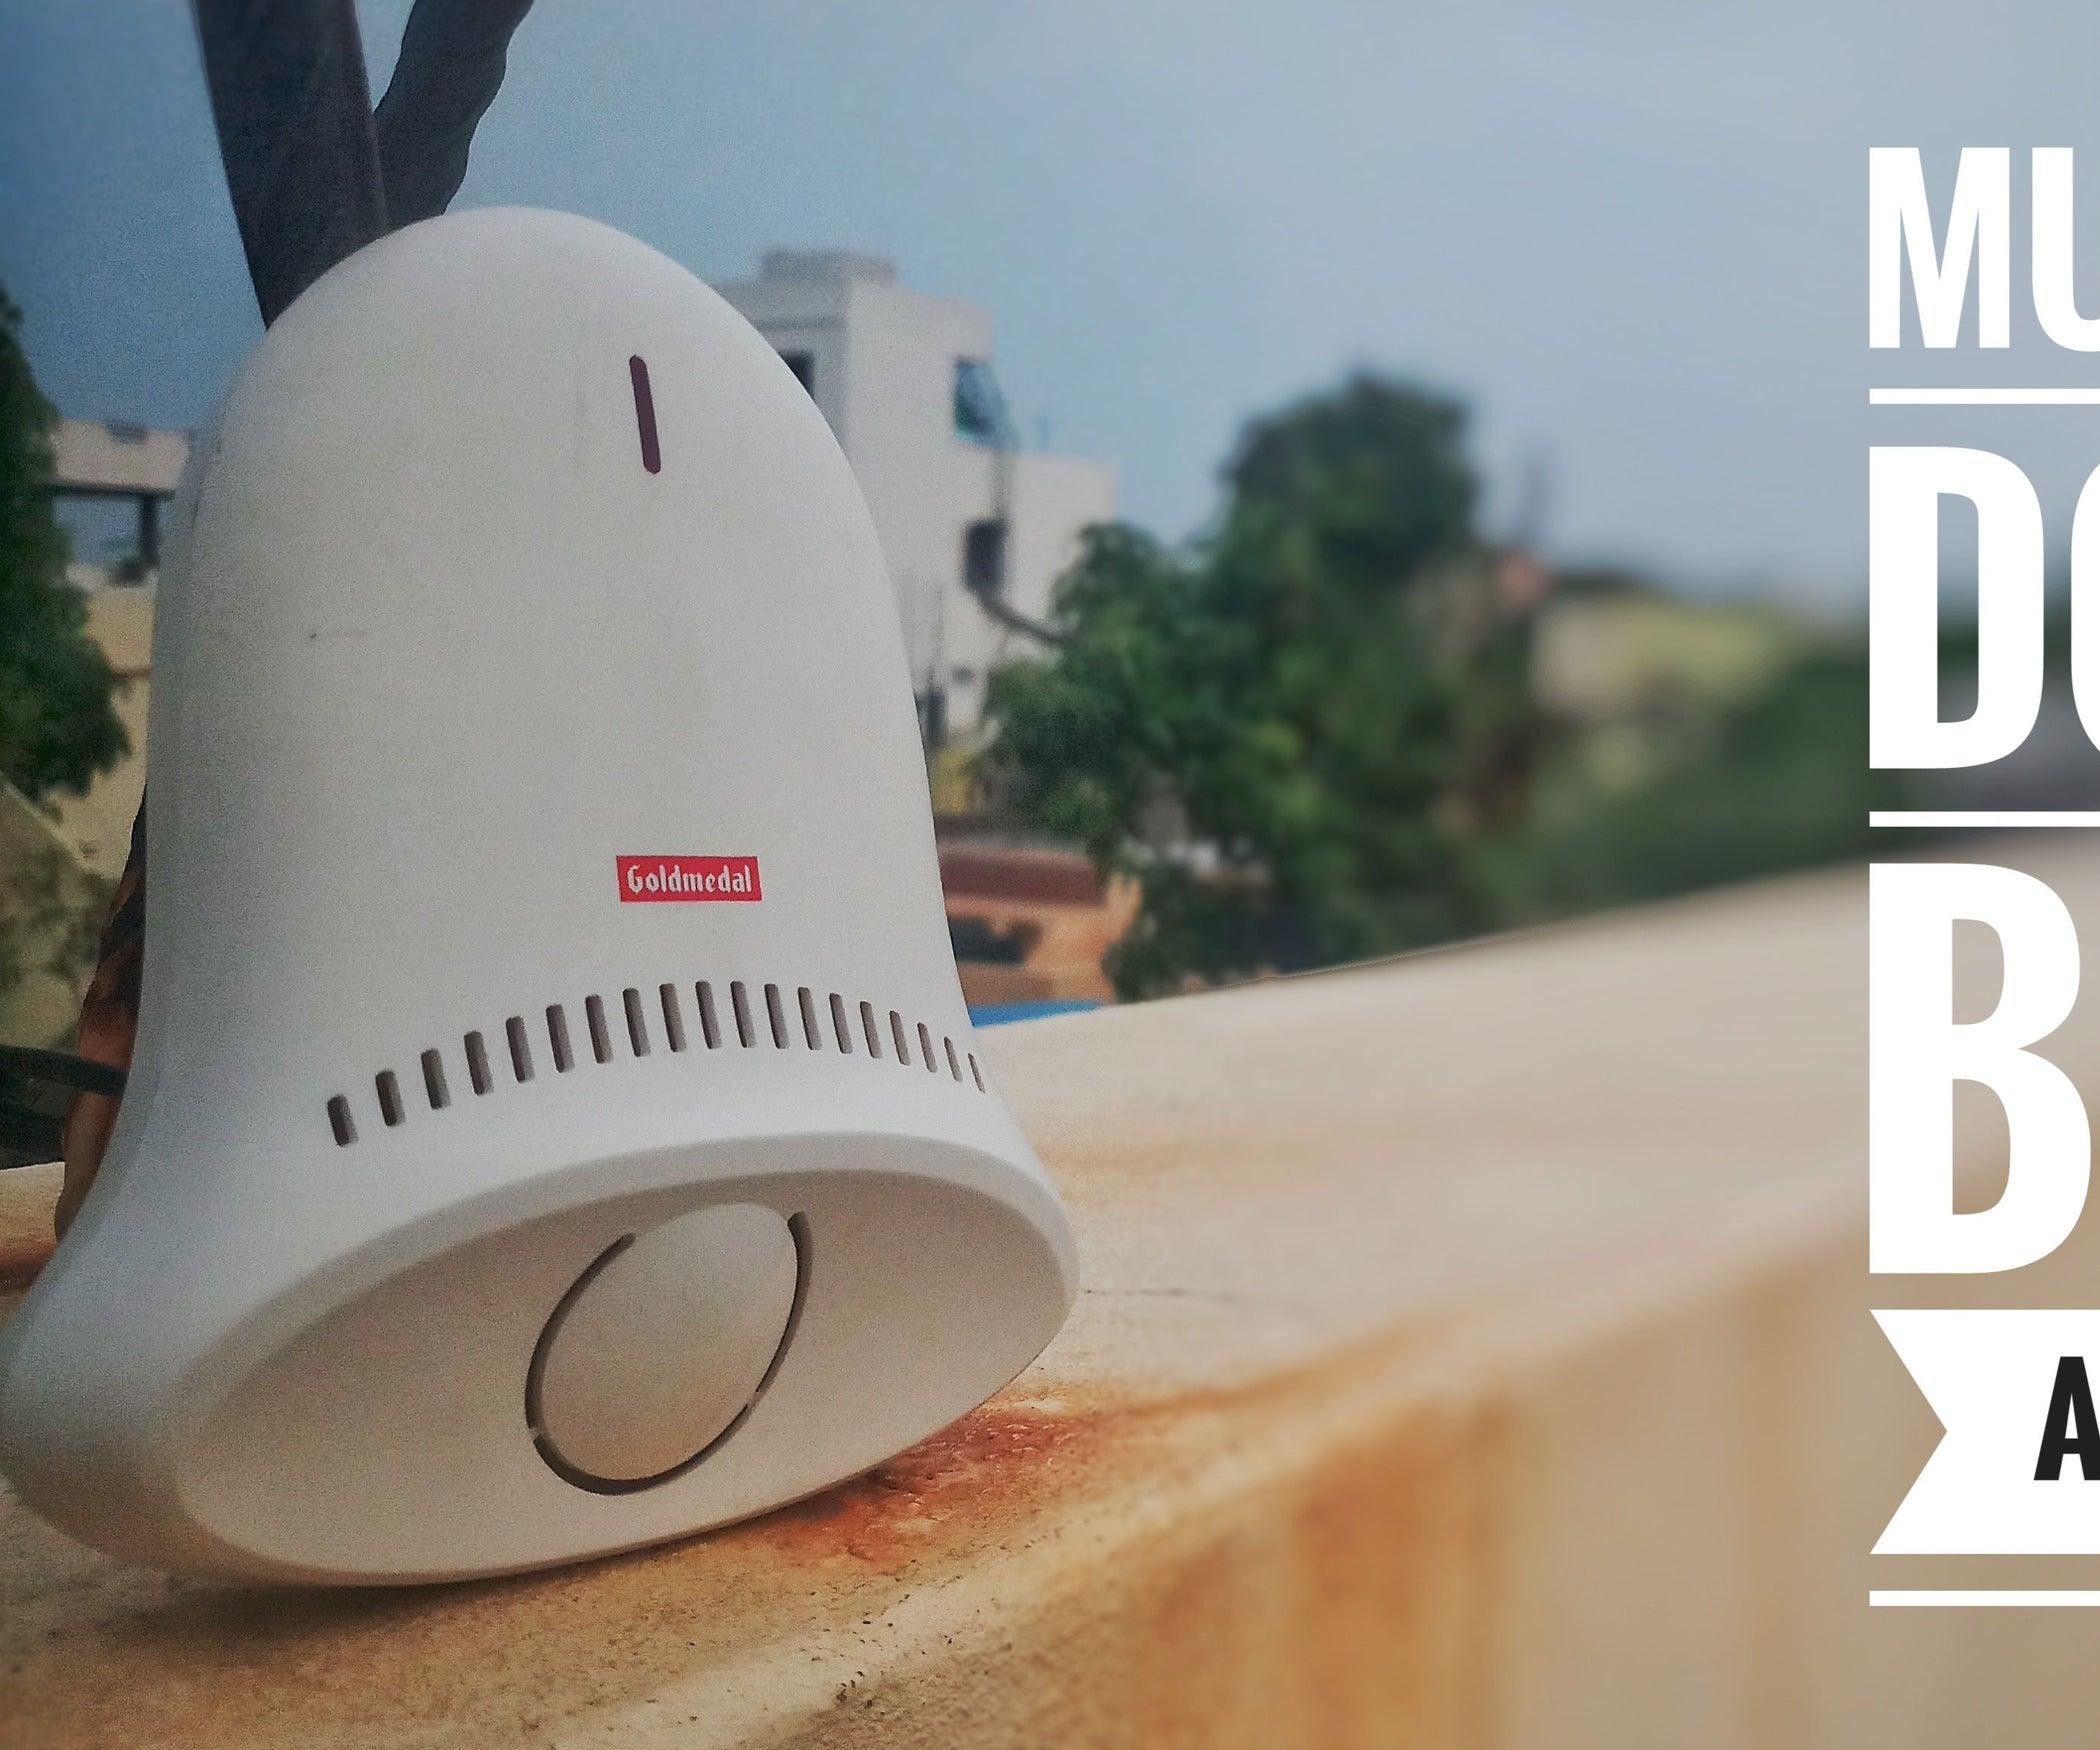 Musical Doorbell At Home Using 555 Timer And Um66 Open Door Alarm Circuit